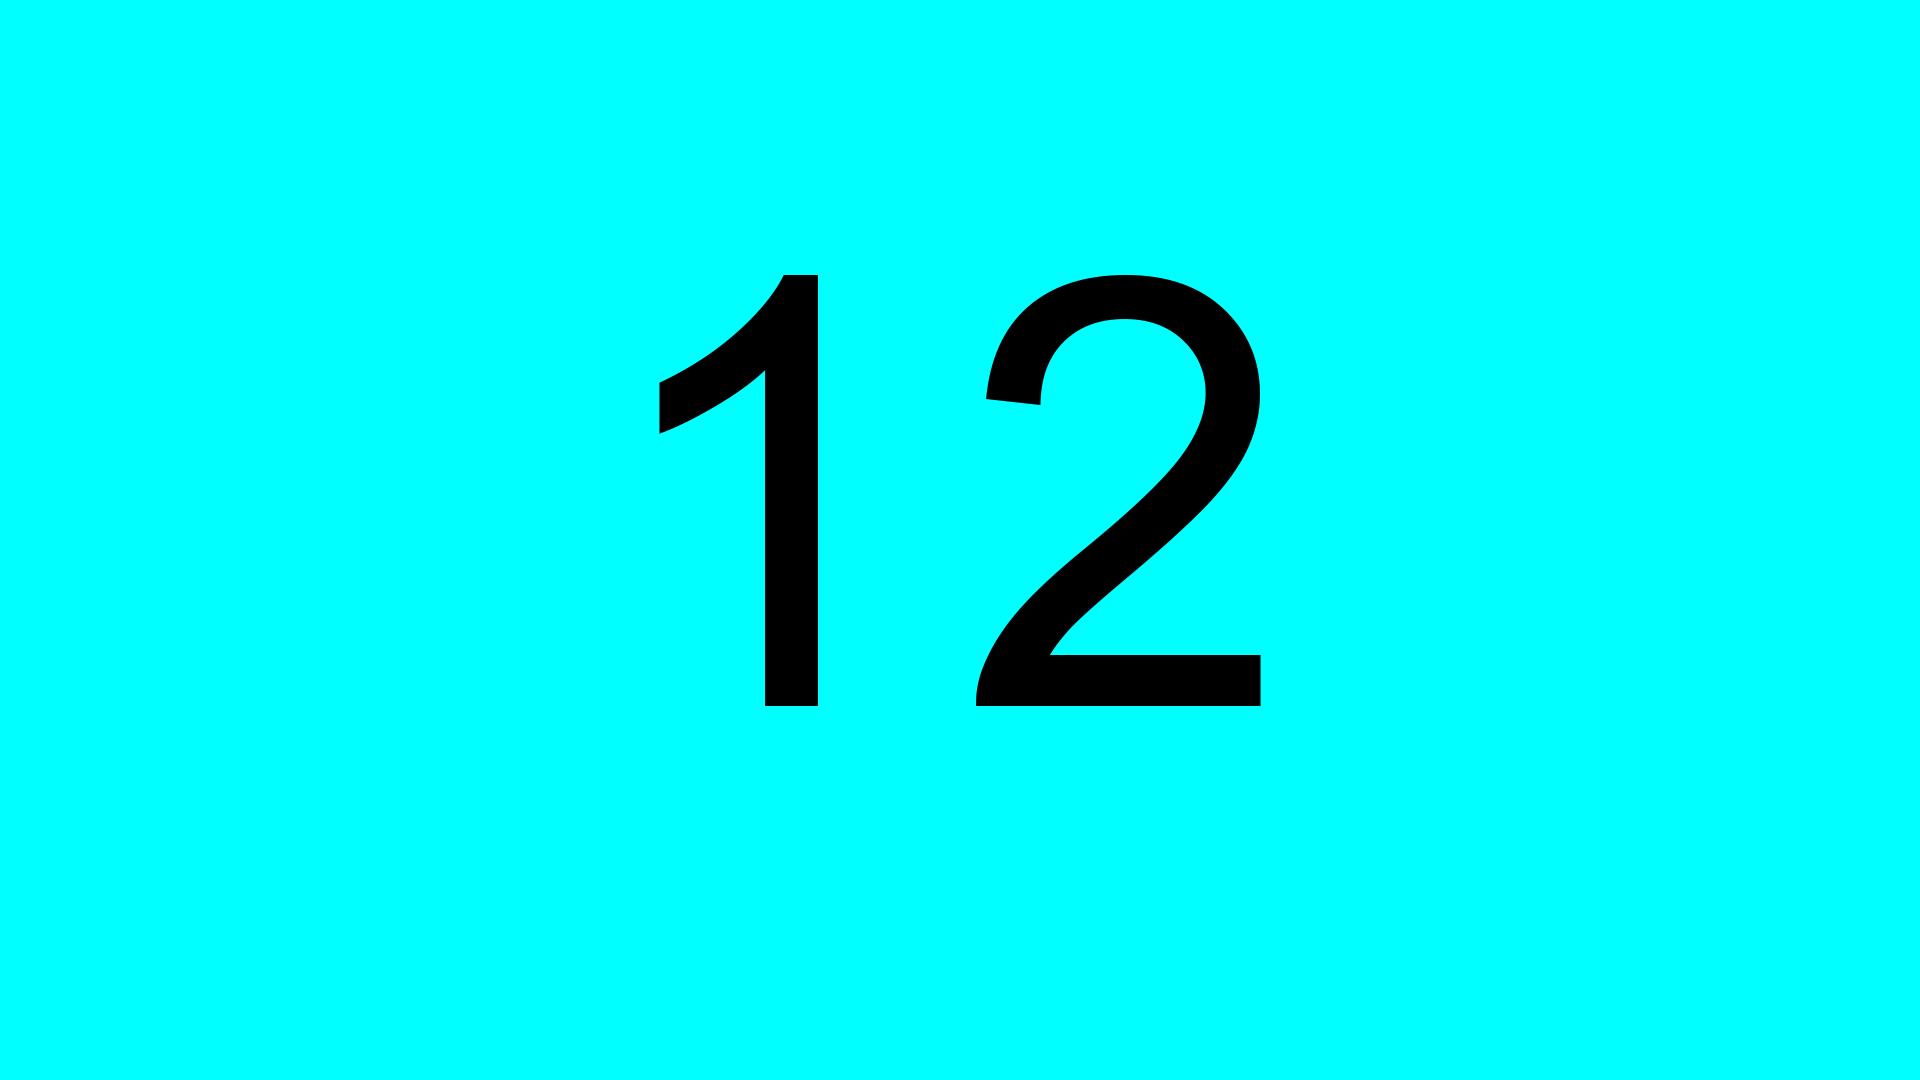 Cyan_12